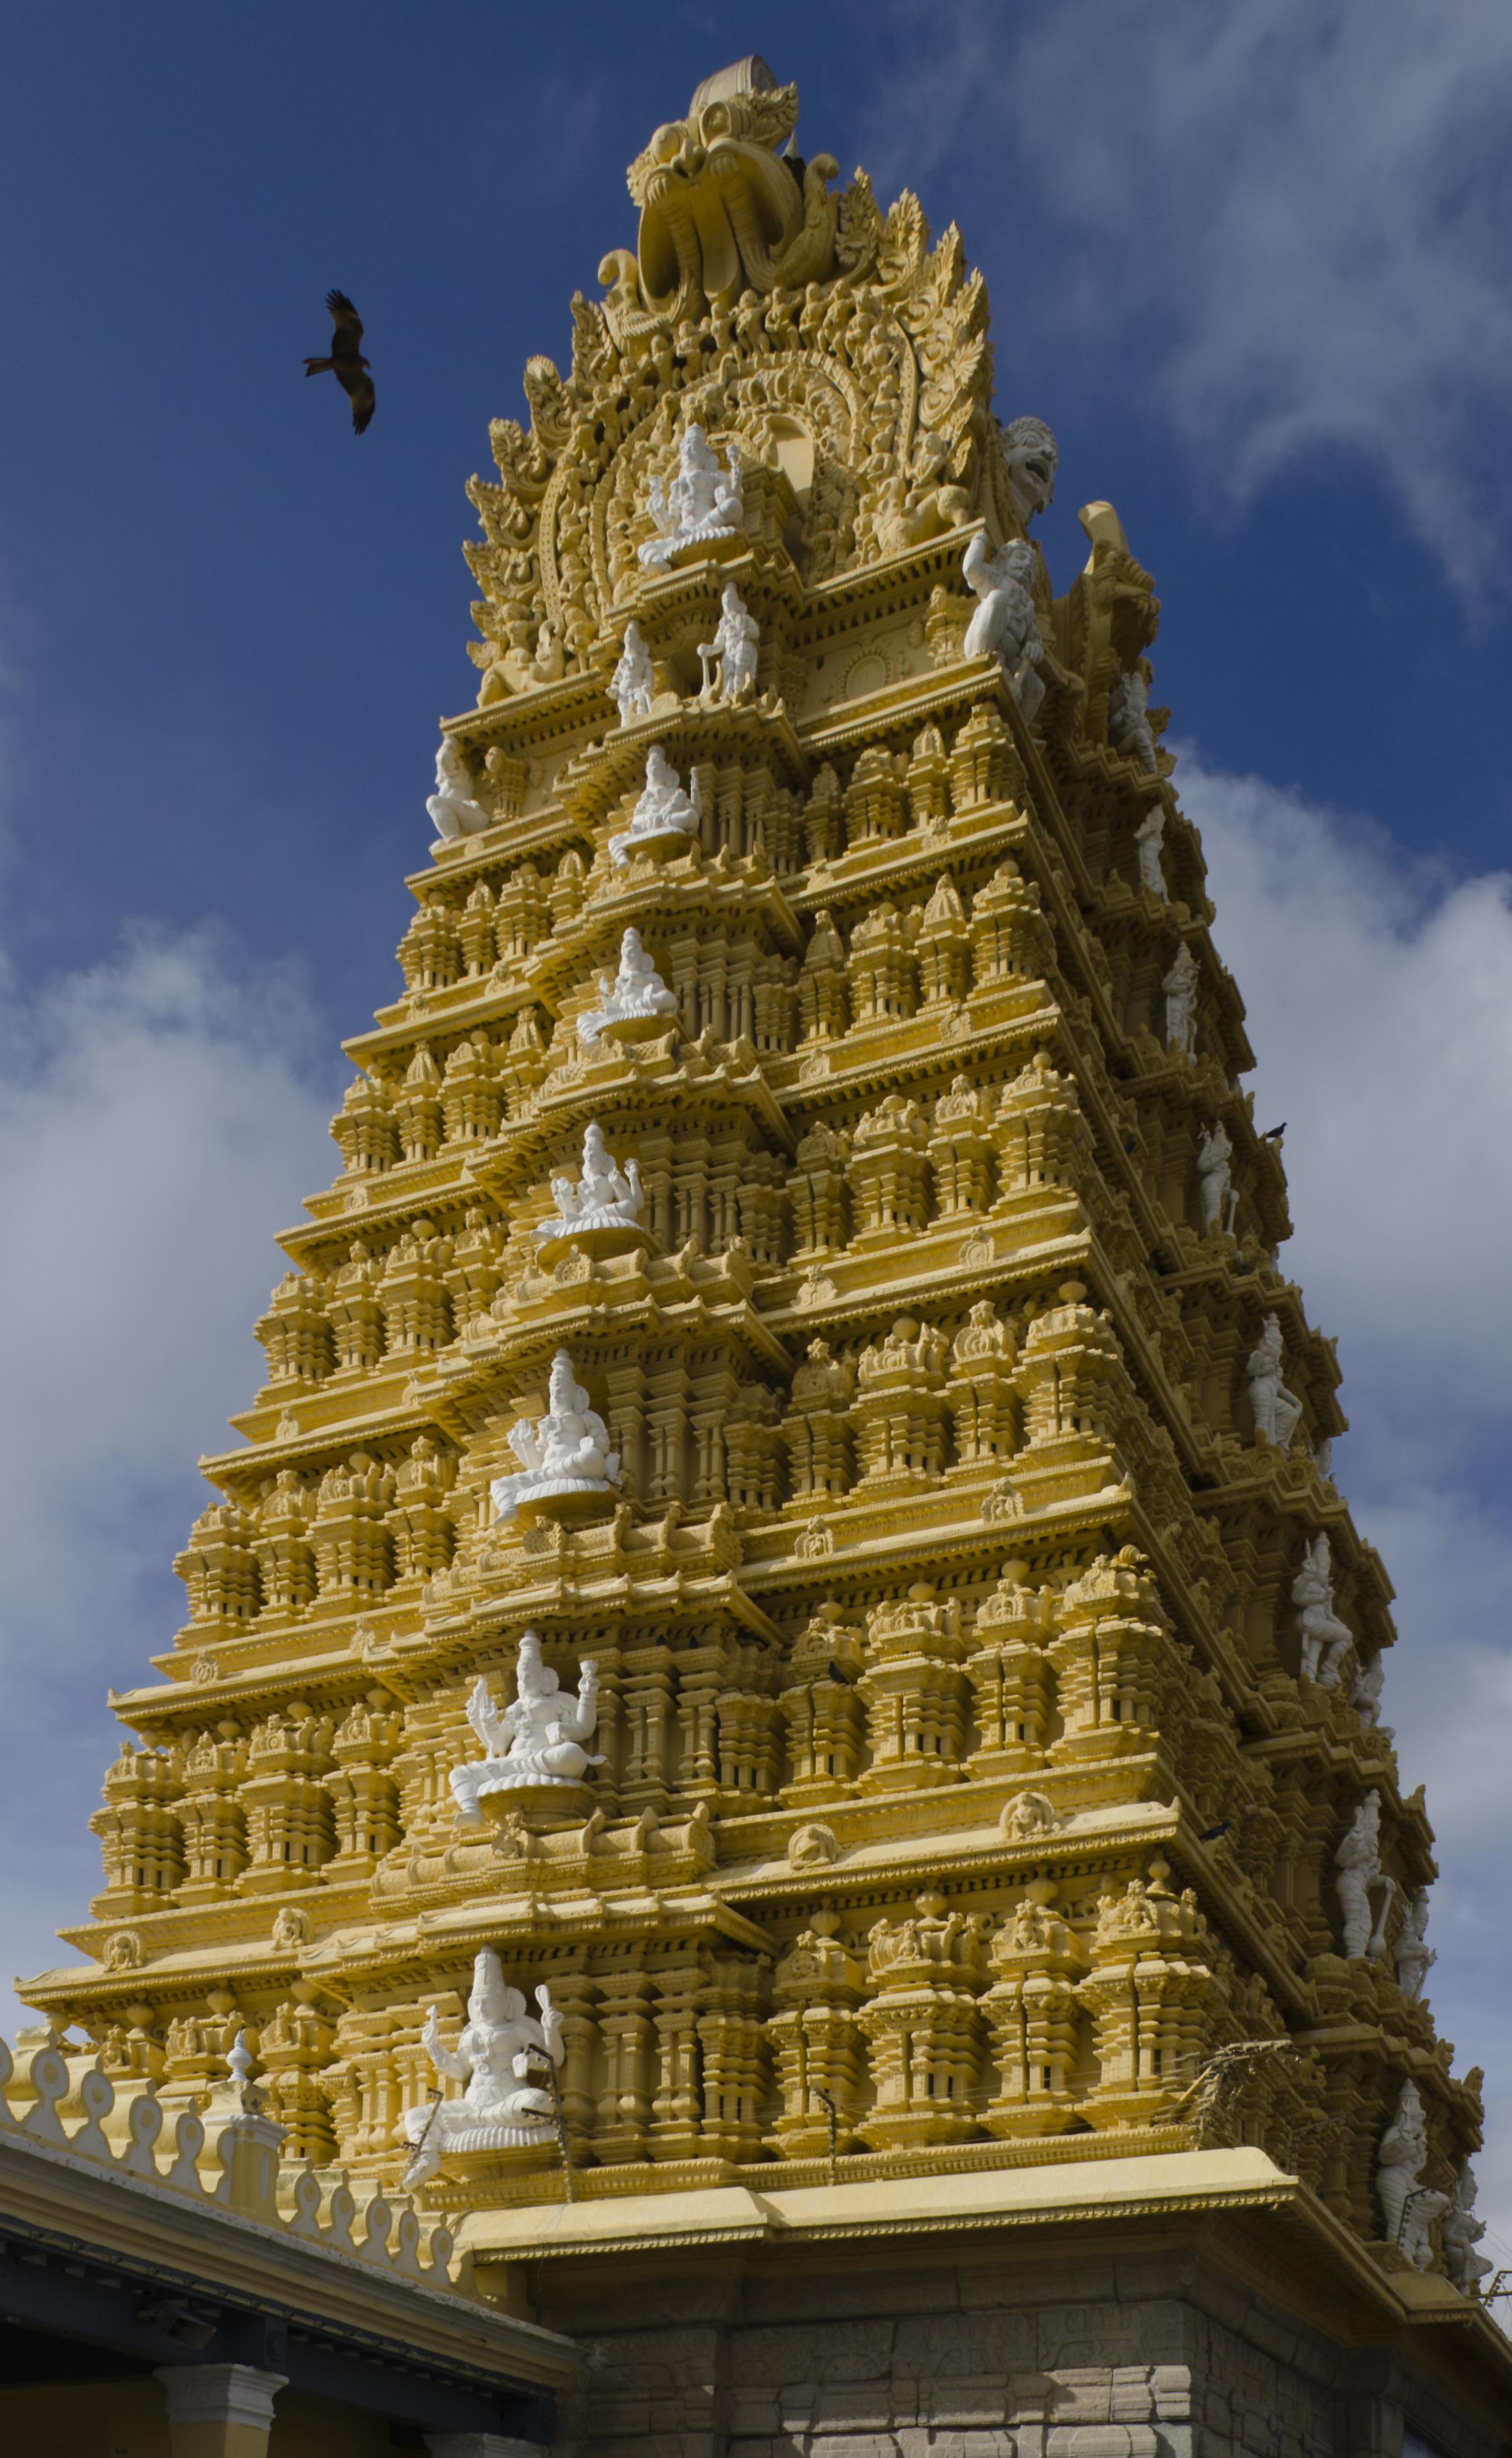 File:Sri Chamundeshwari Temple1.jpg - Wikimedia Commons